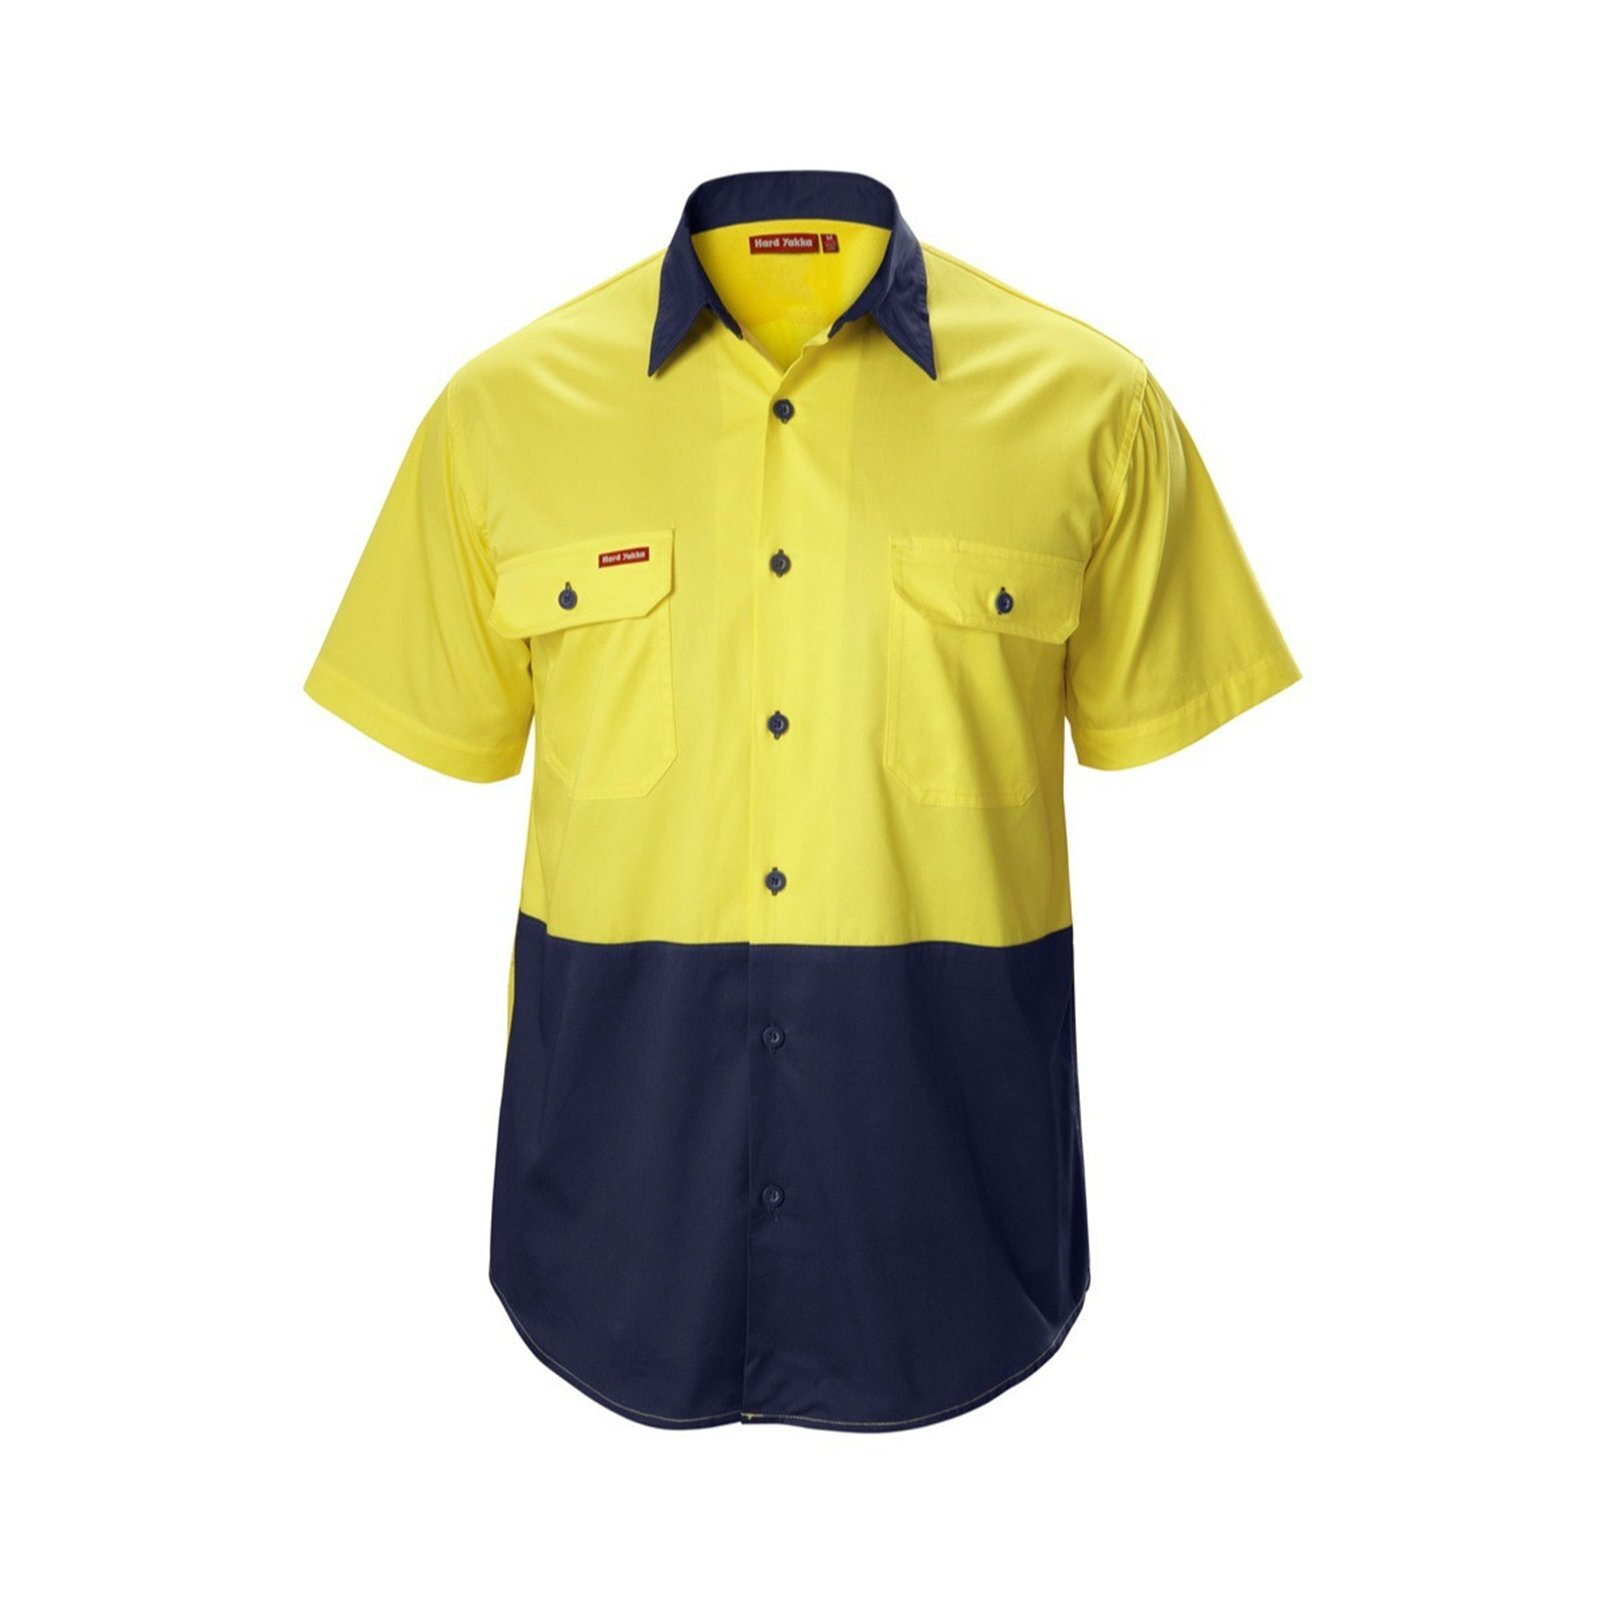 Hard Yakka Koolgear Short Sleeve Shirt - S Yellow/Navy